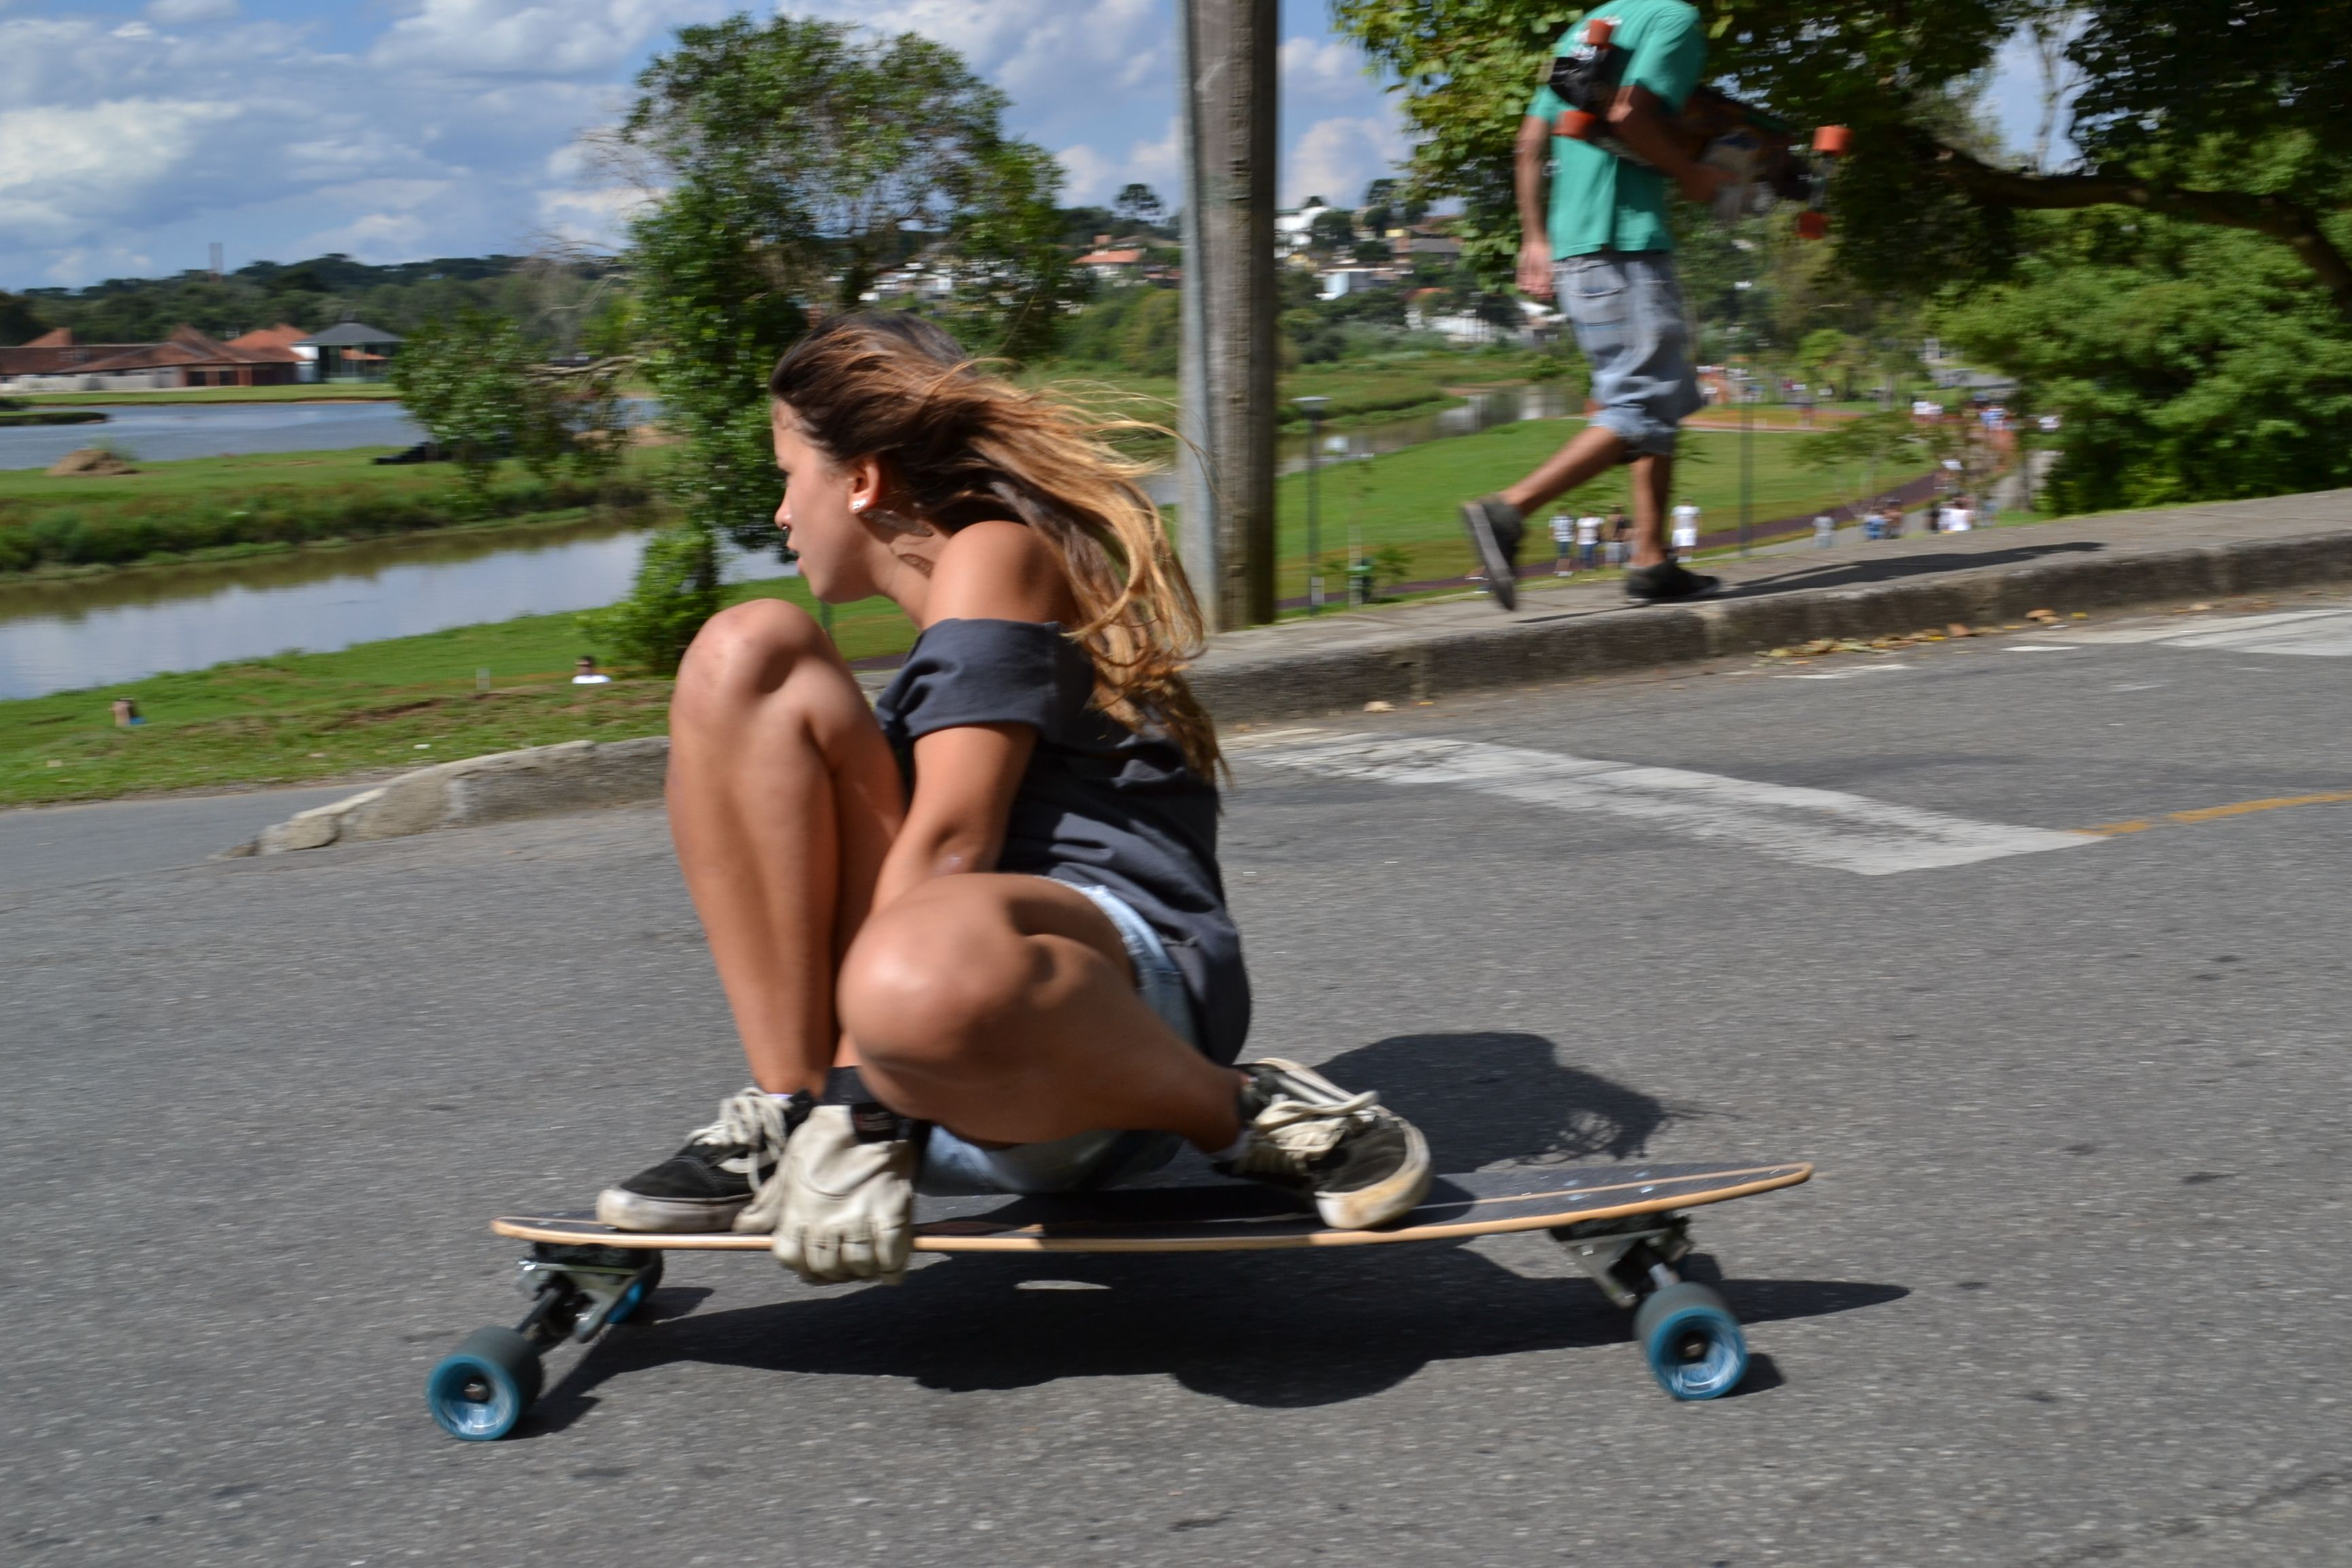 Manda Kay In Naked Blonde Skateboards Outdoors